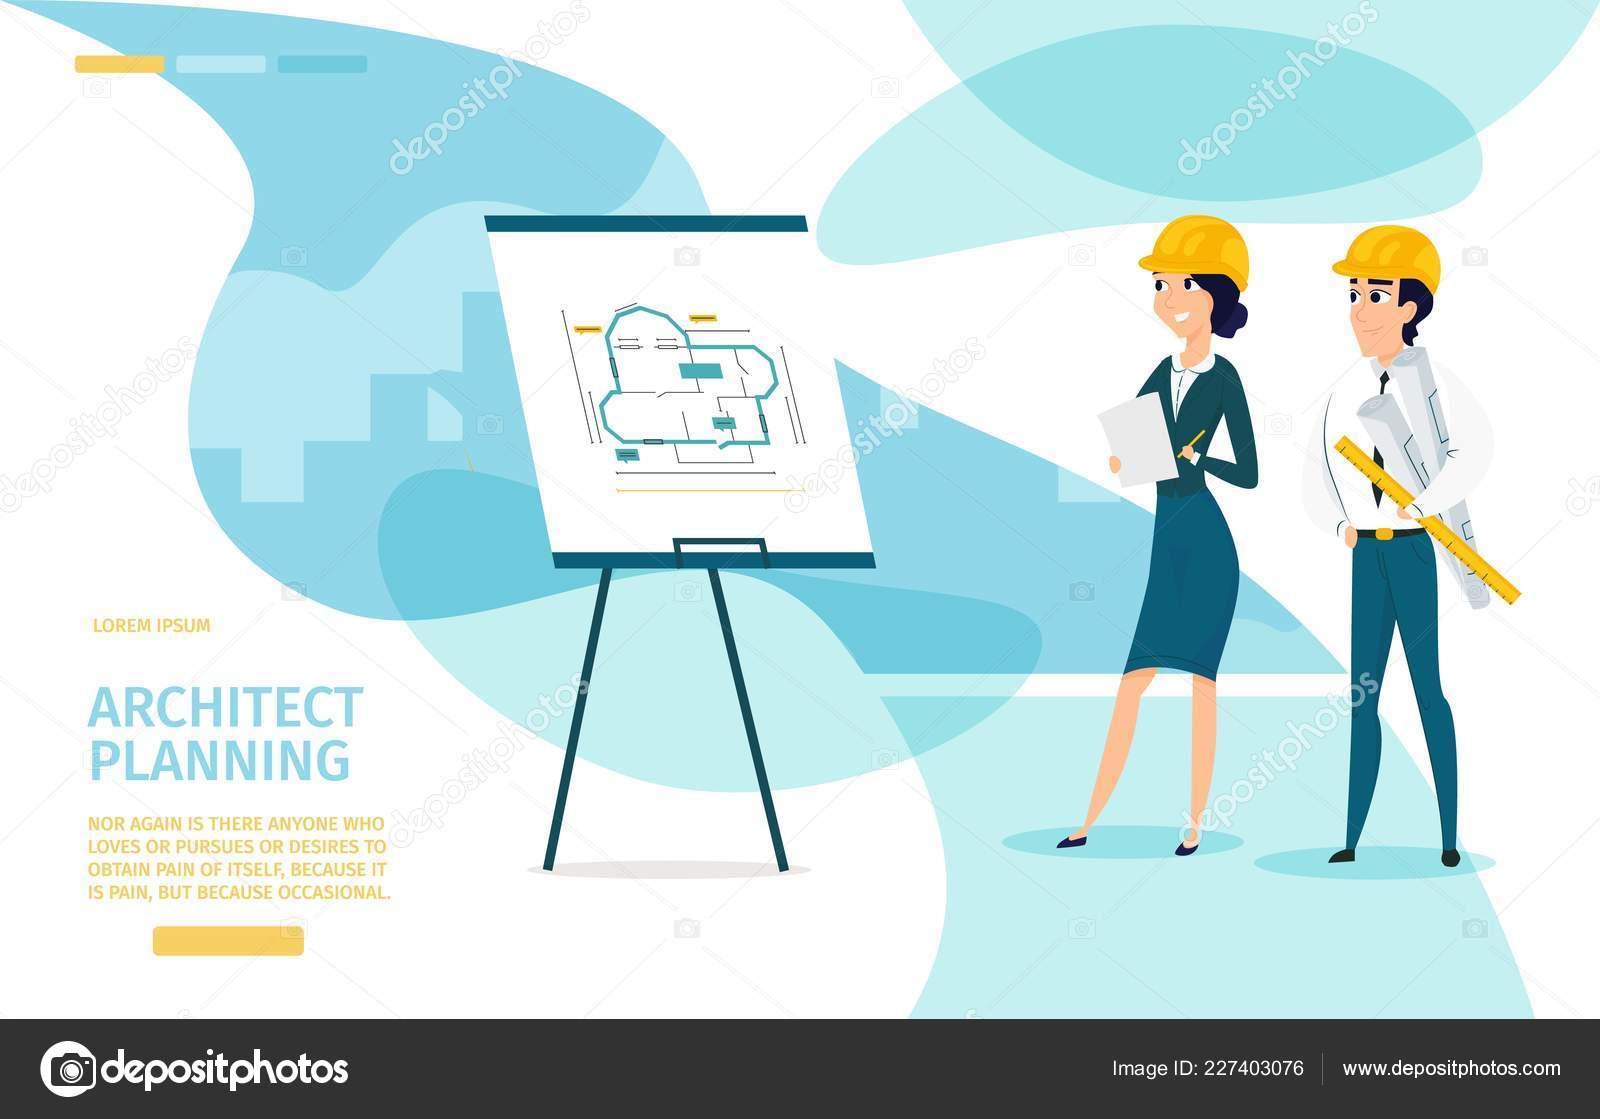 Architect planning cartoon vector landing page u2014 stock vector